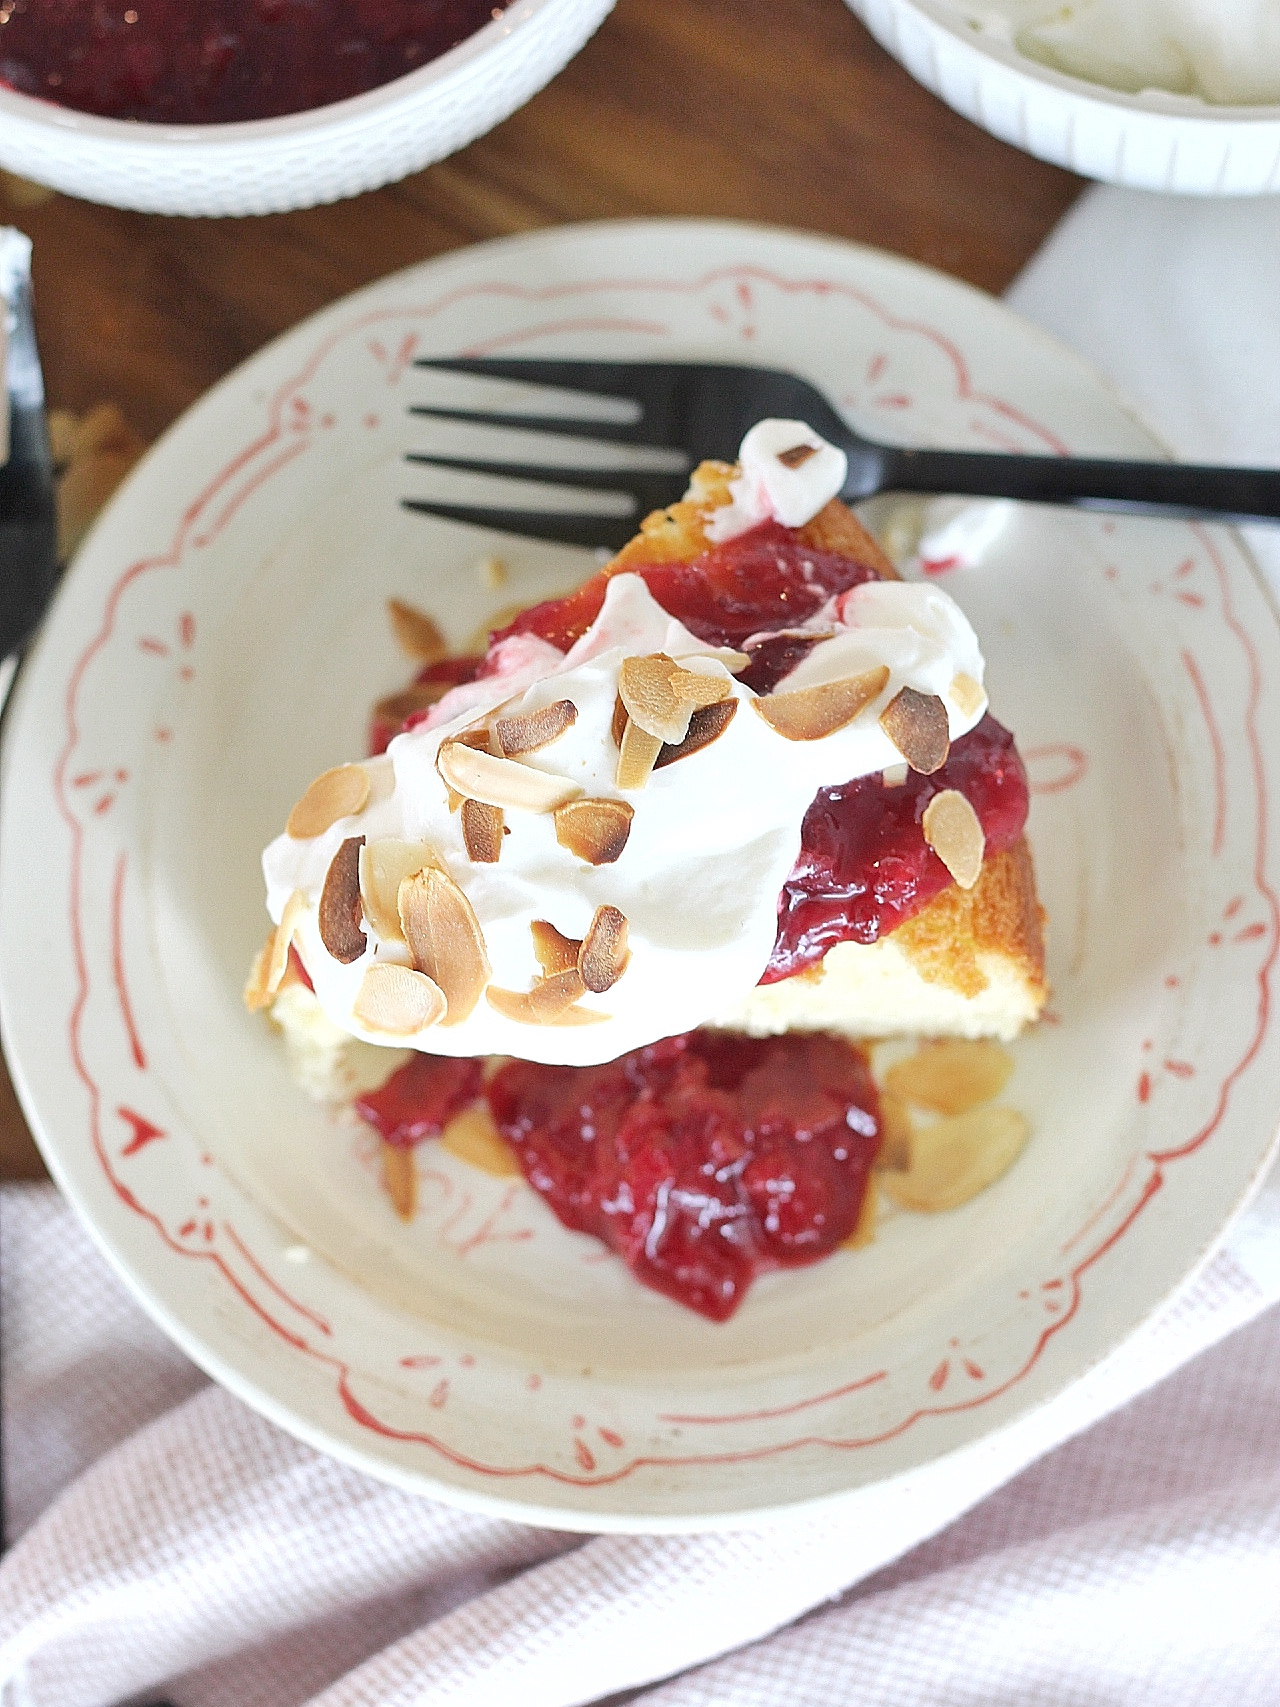 Cherry Almond Cake: tender almond cake layers with a cherry almond compote, buttermilk whipped cream and toasted almonds. #cakebycourtney #cherryalmondcake #classiccake #vintagecake #cakerecipe #easycakerecipe